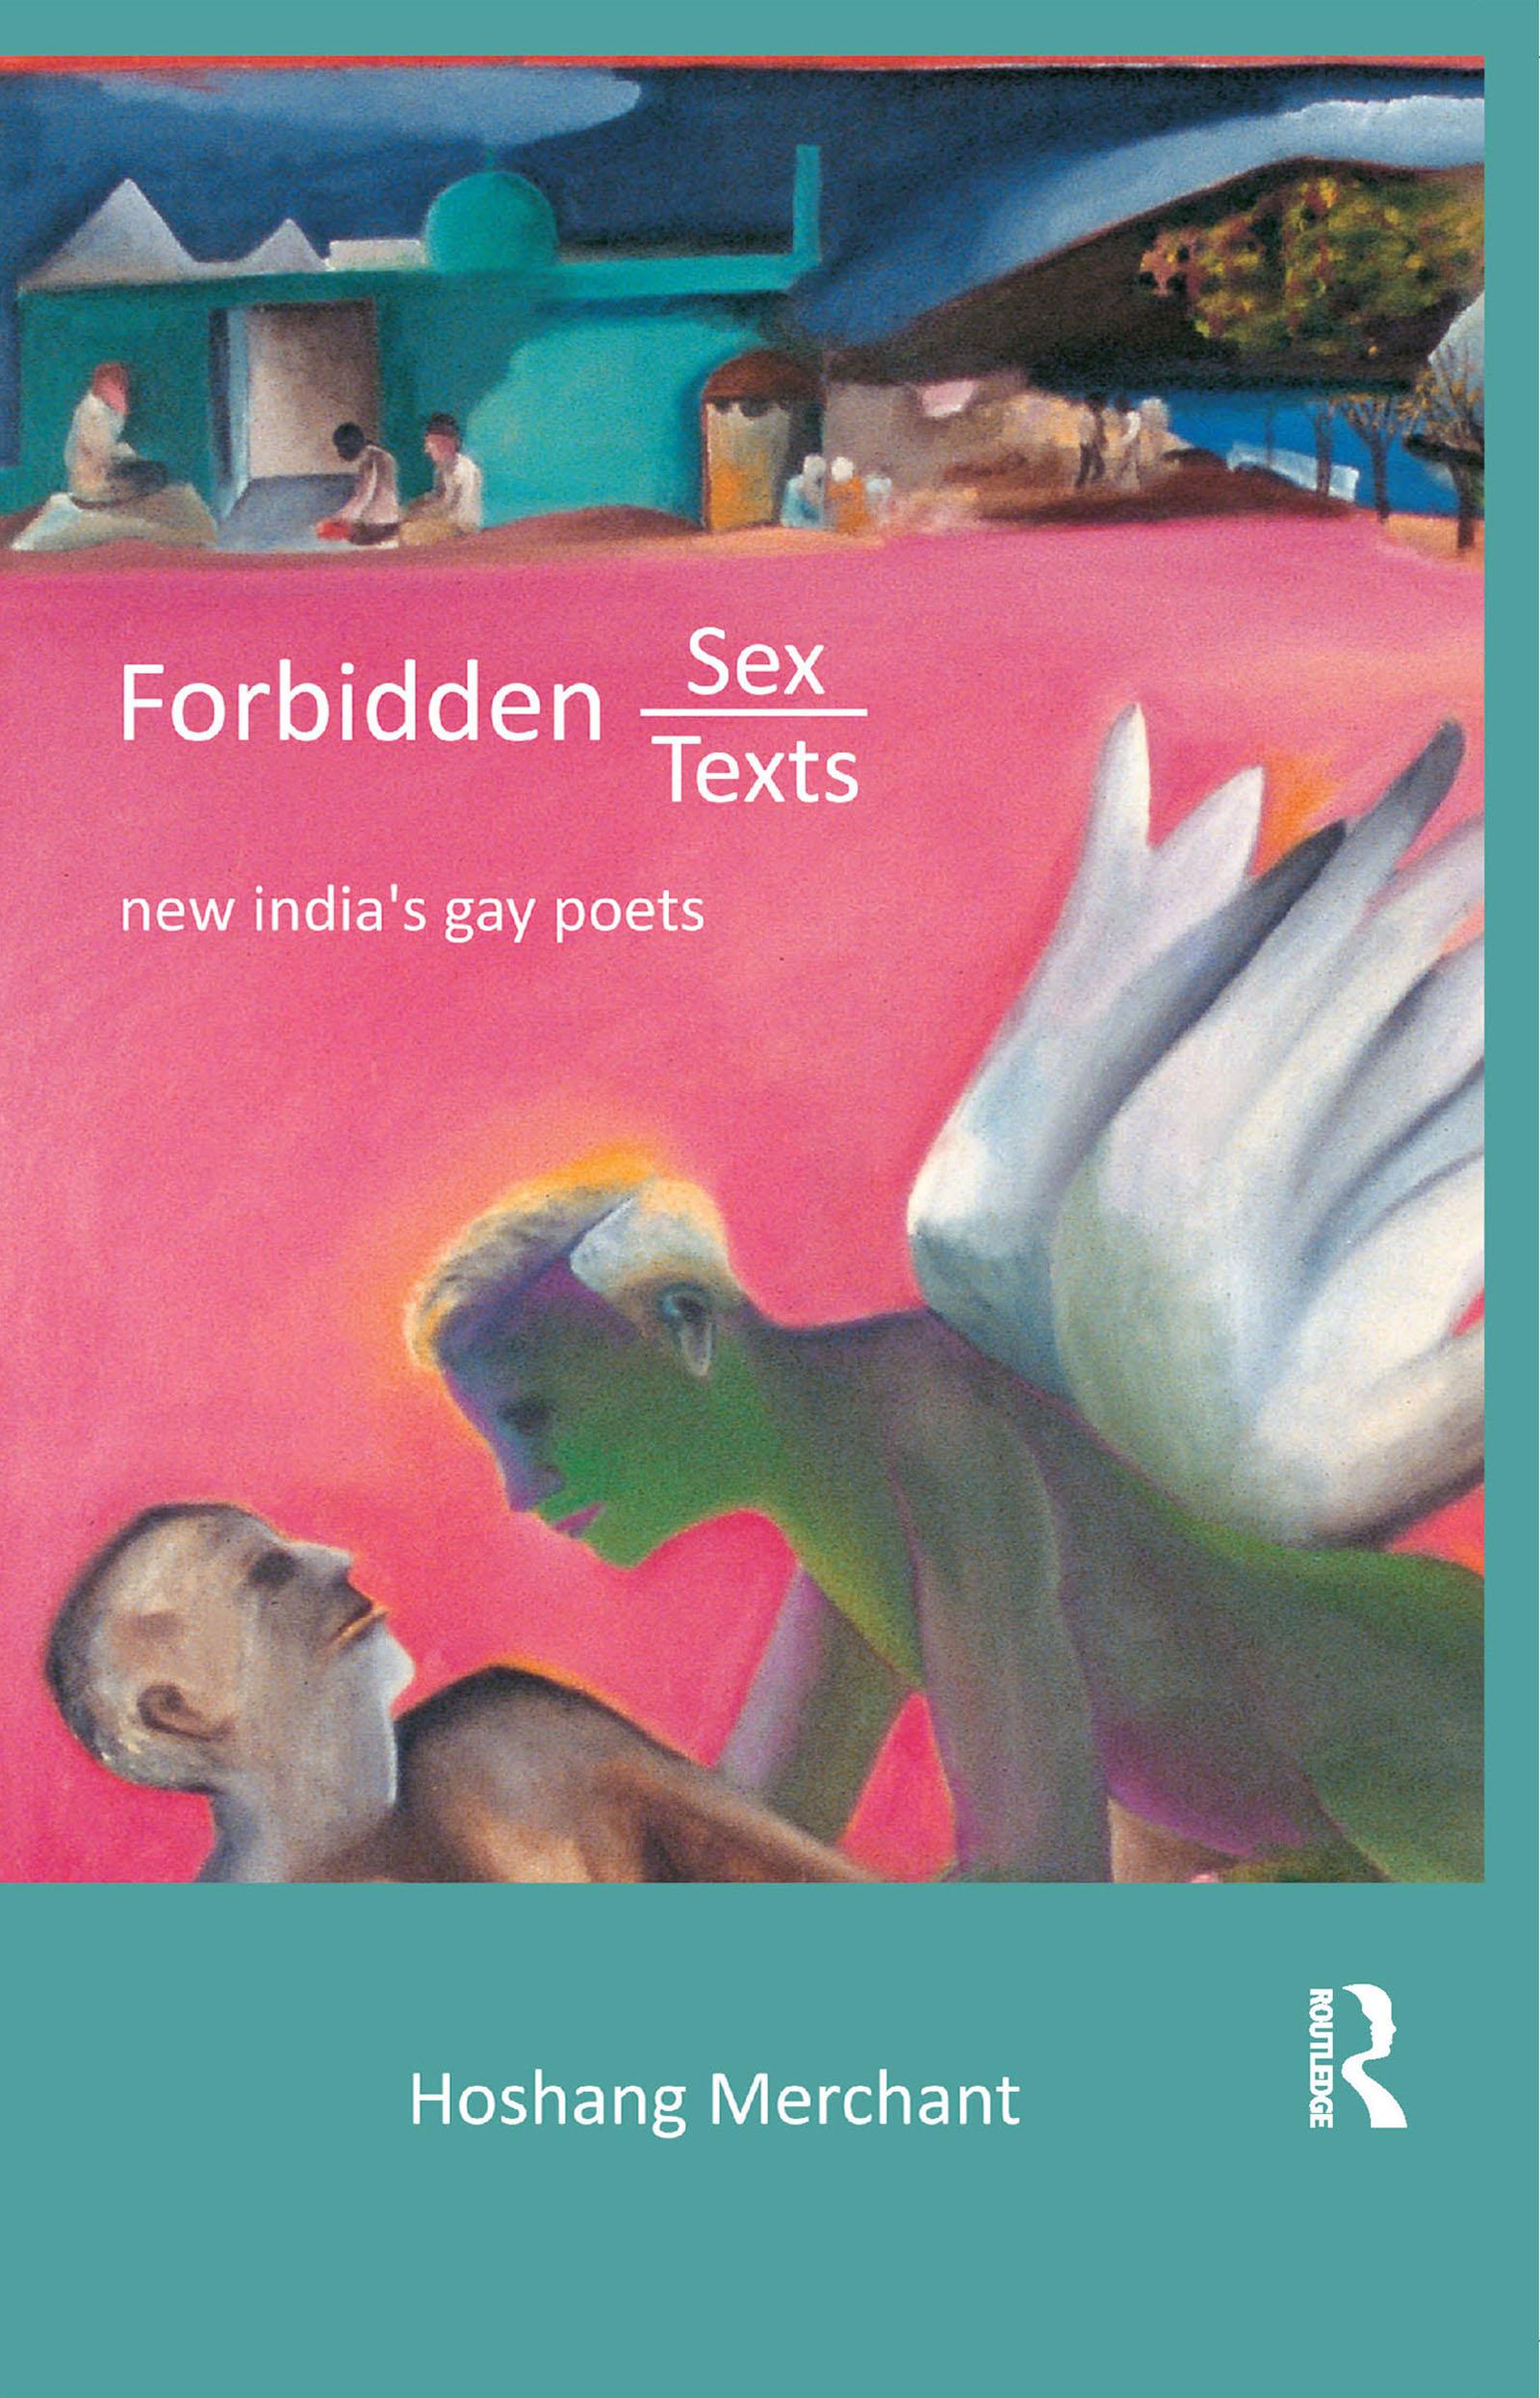 Forbidden Sex/Texts